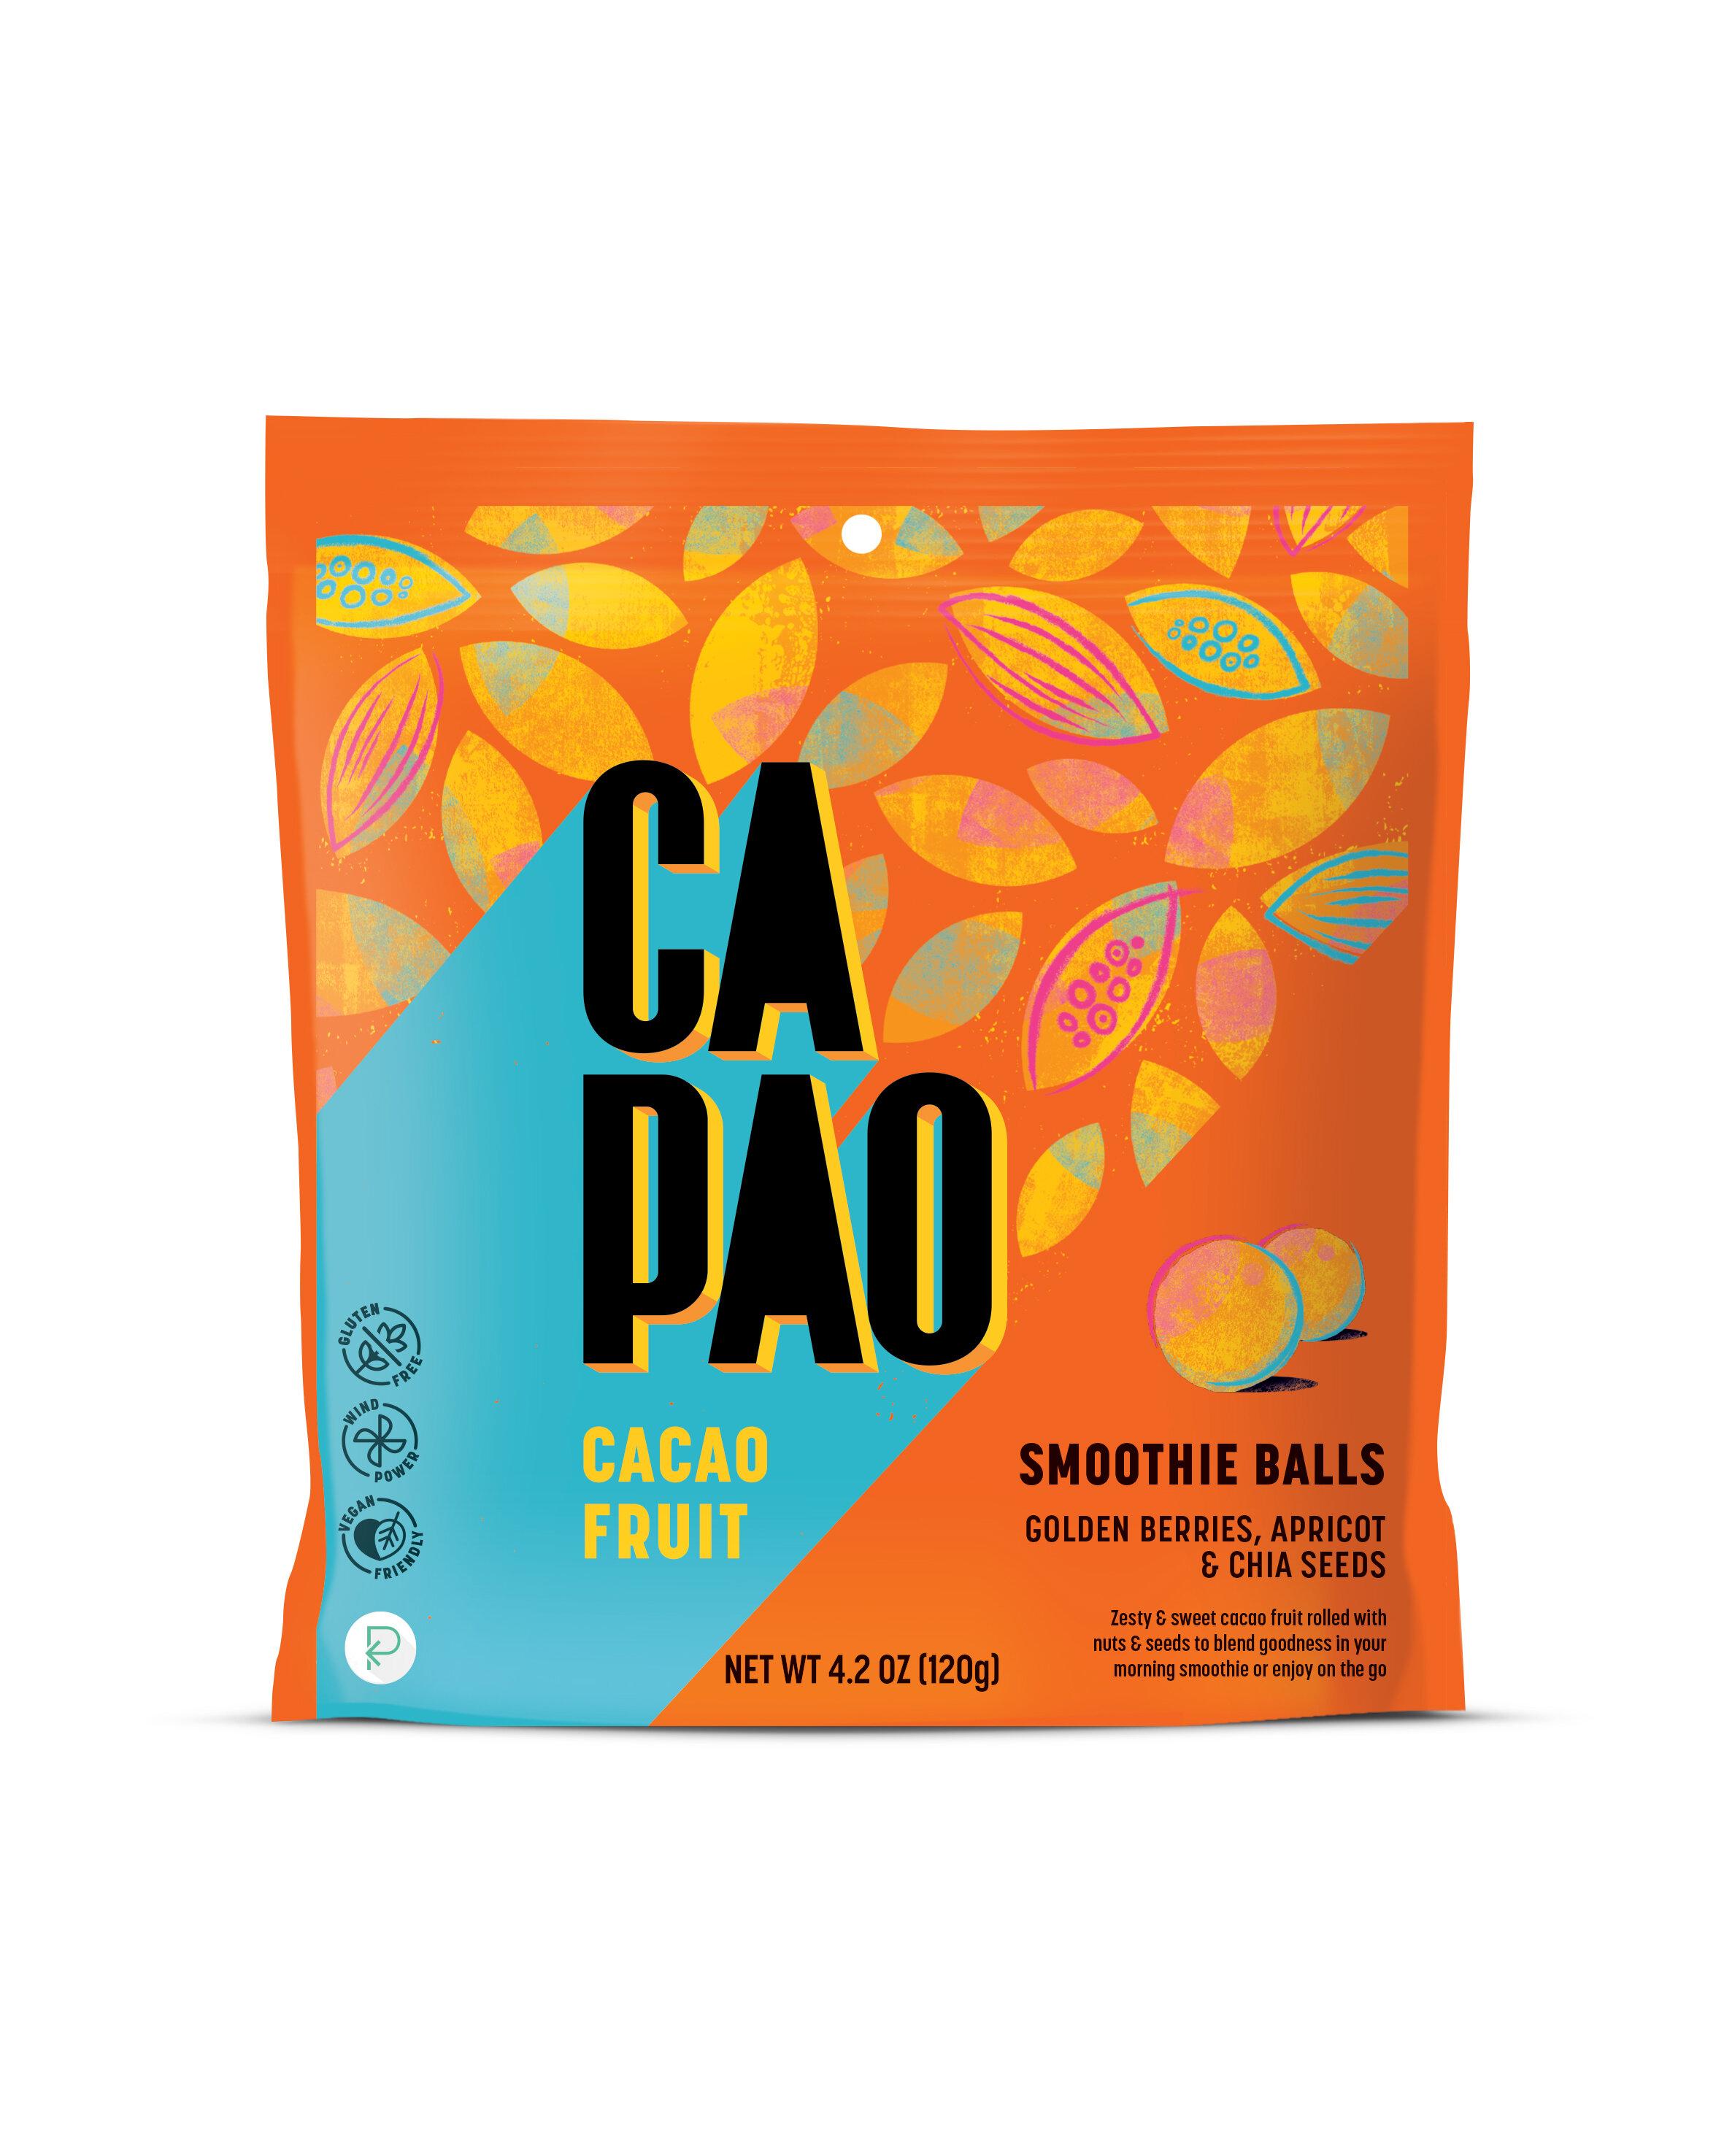 CaPao_Smoothie_Balls_Seeds_FOP.jpg